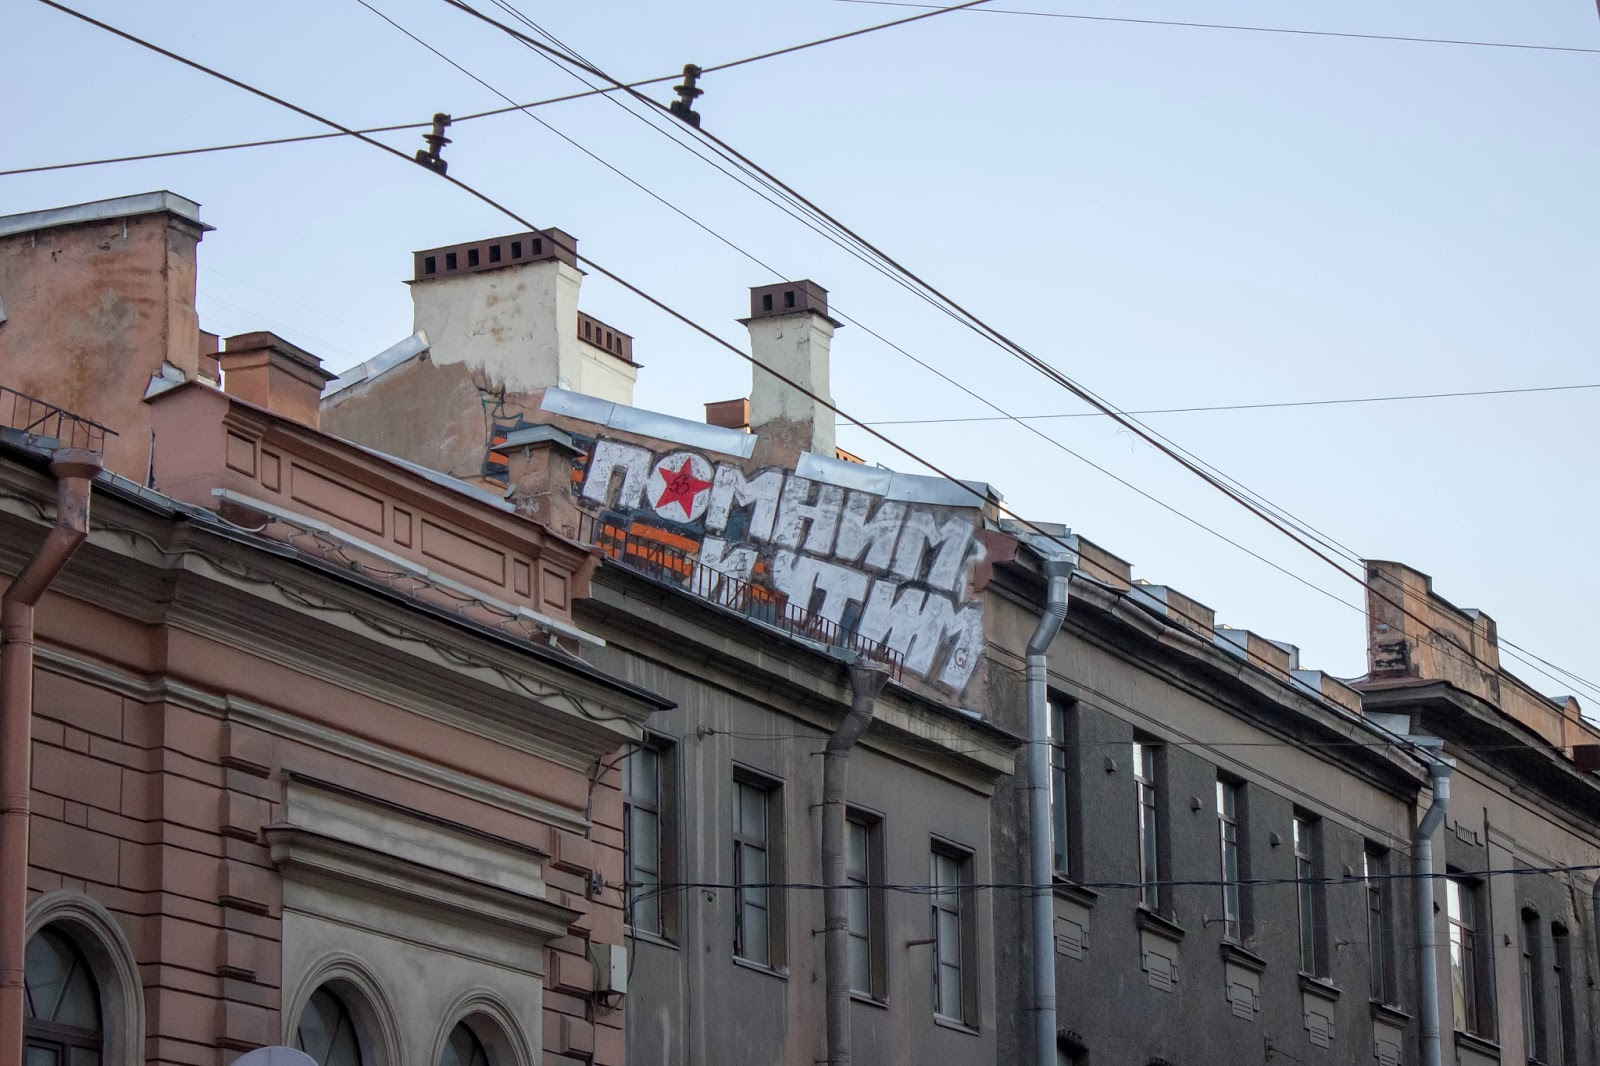 Санкт-Петербург, Россия, Помним и чтим